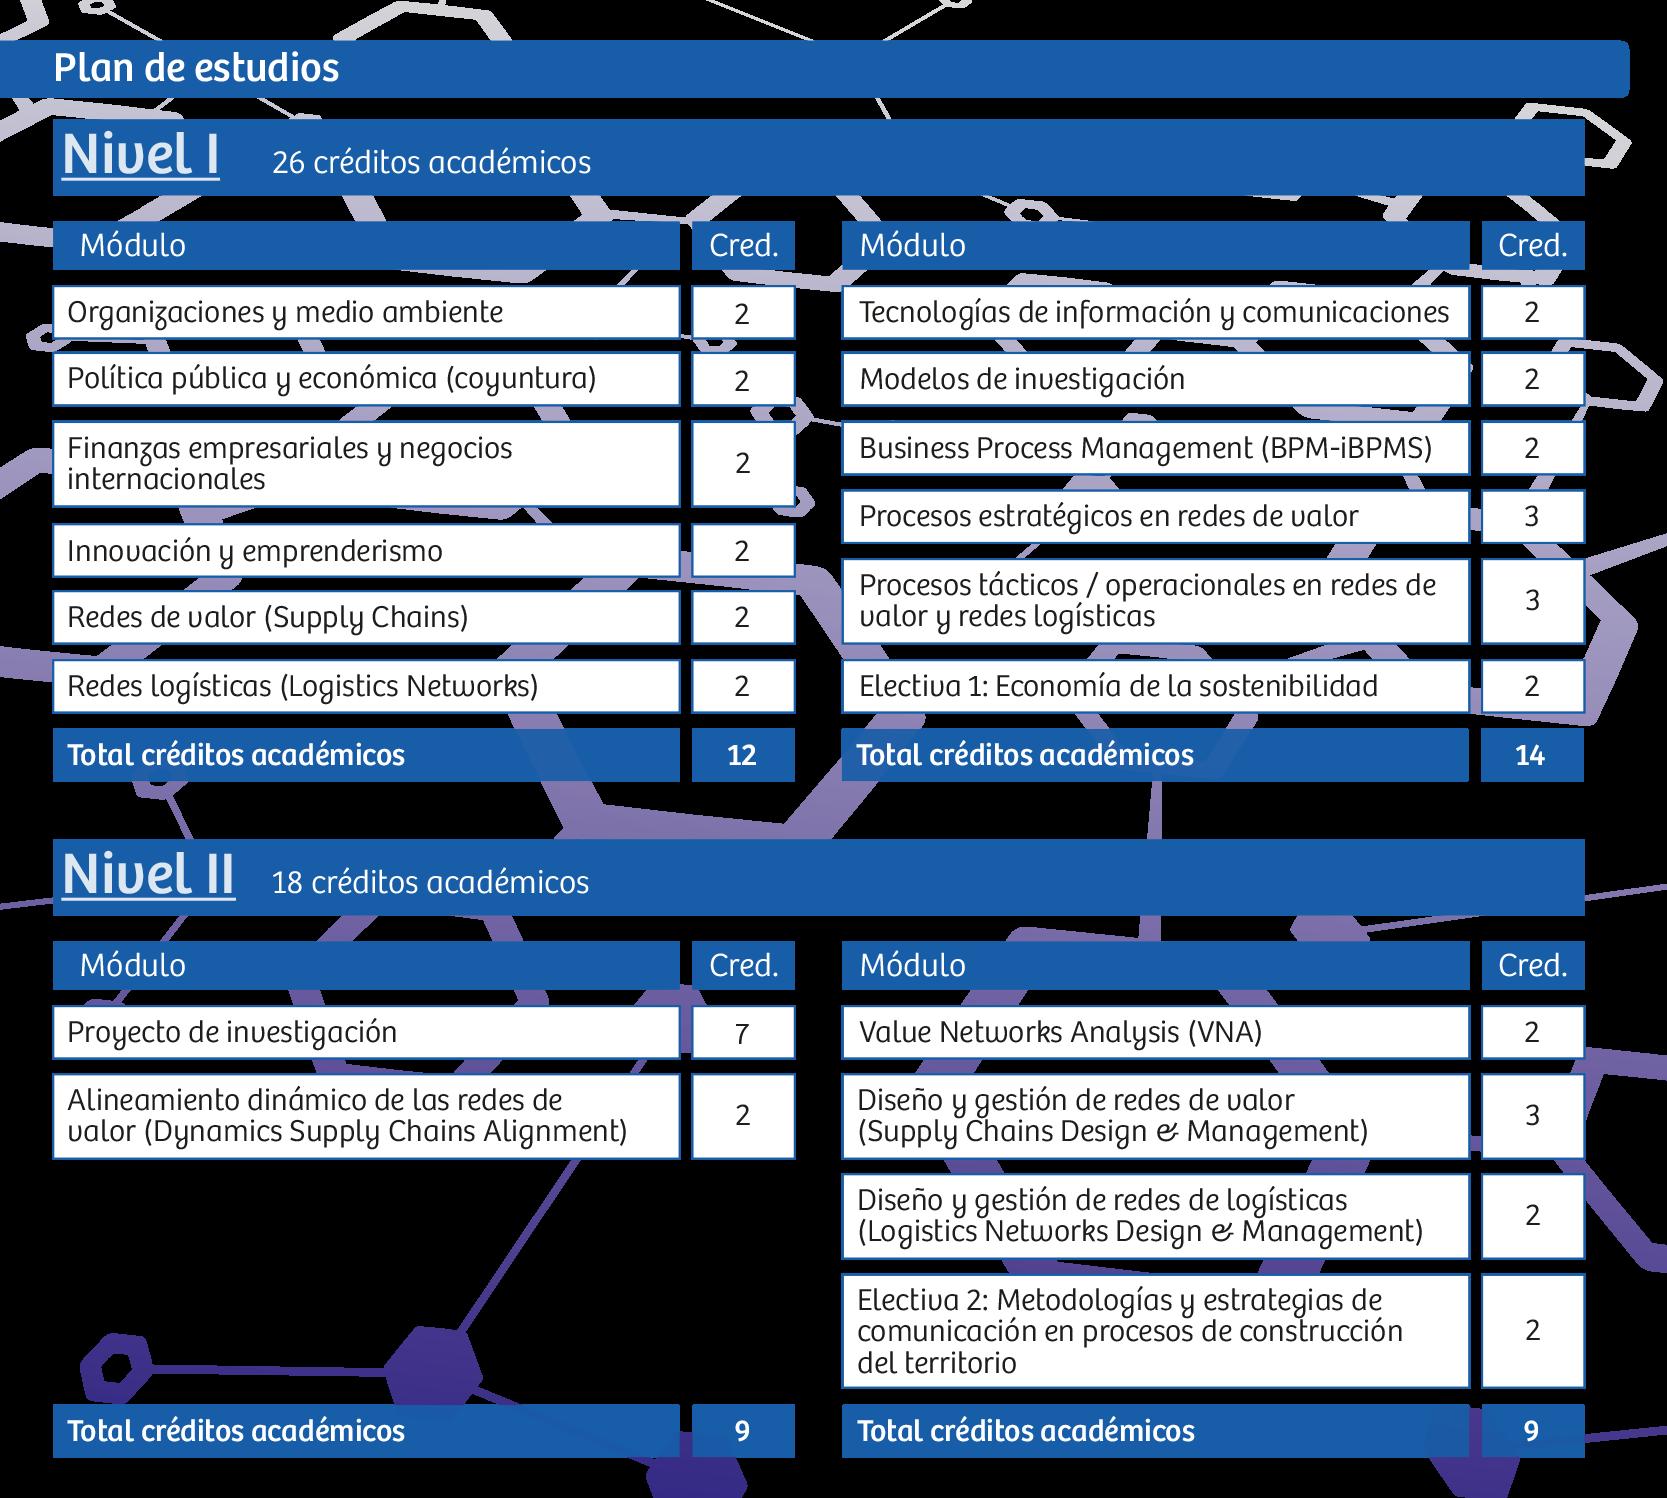 Plan de estudios ML